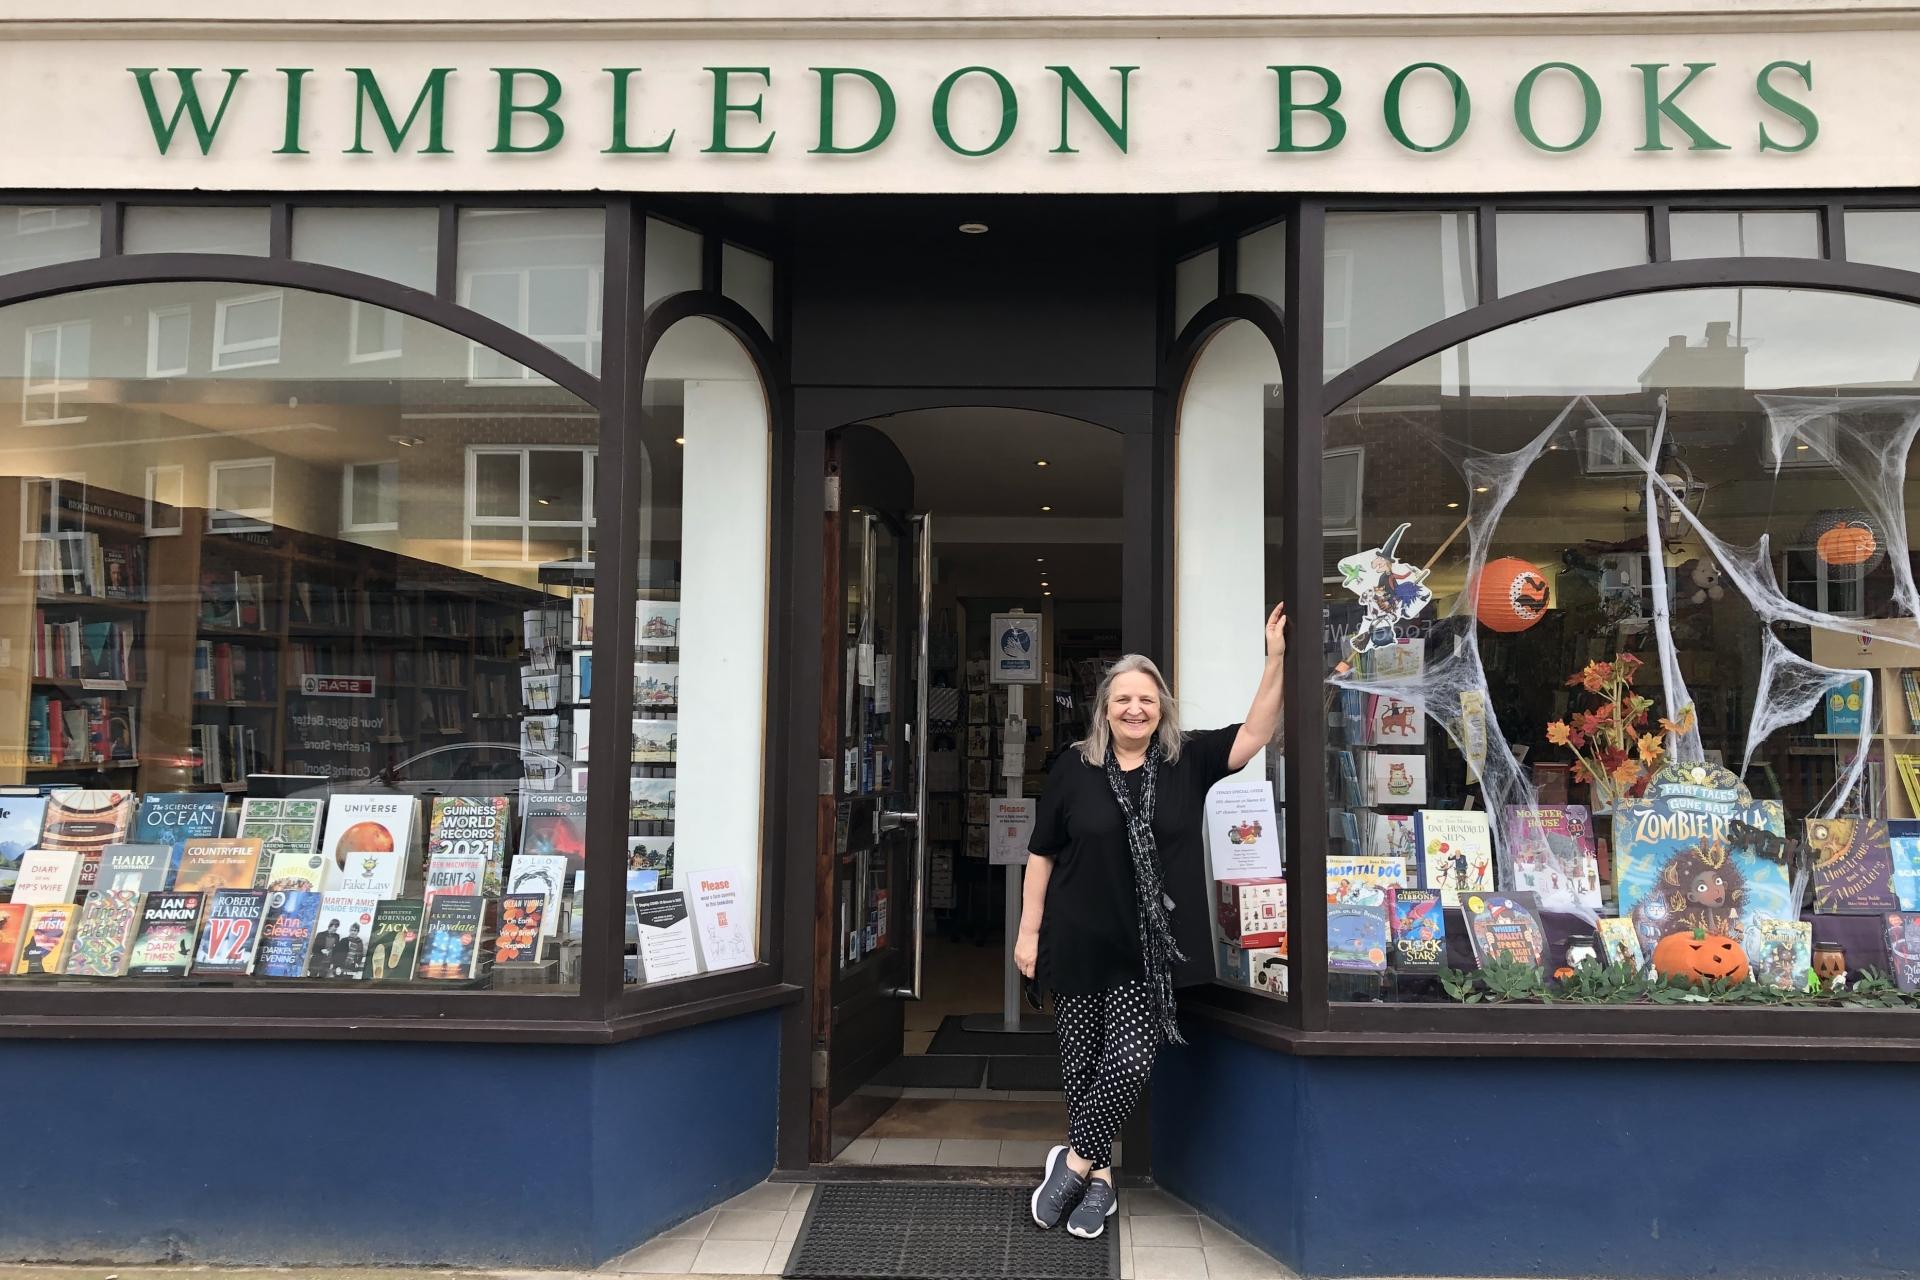 LoveReading Bookshop Feature: Wimbledon Books